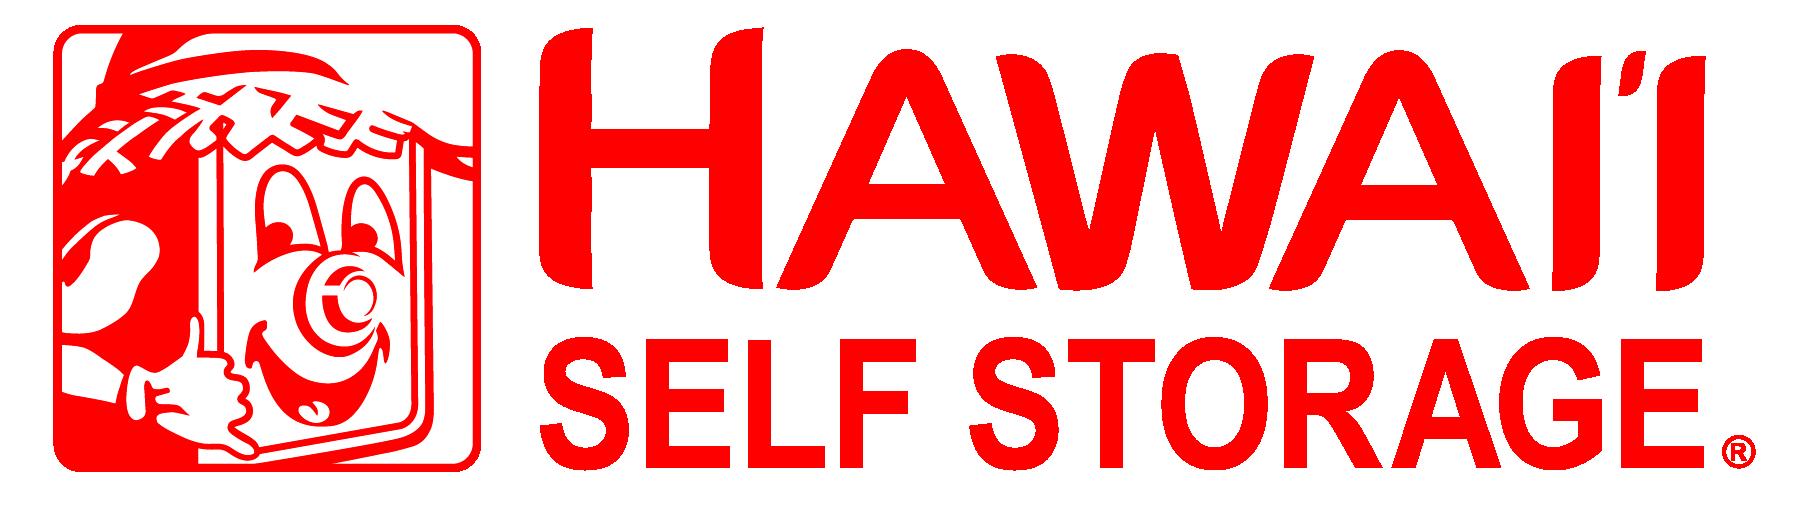 Hawai'i Self Storage Logo 2019